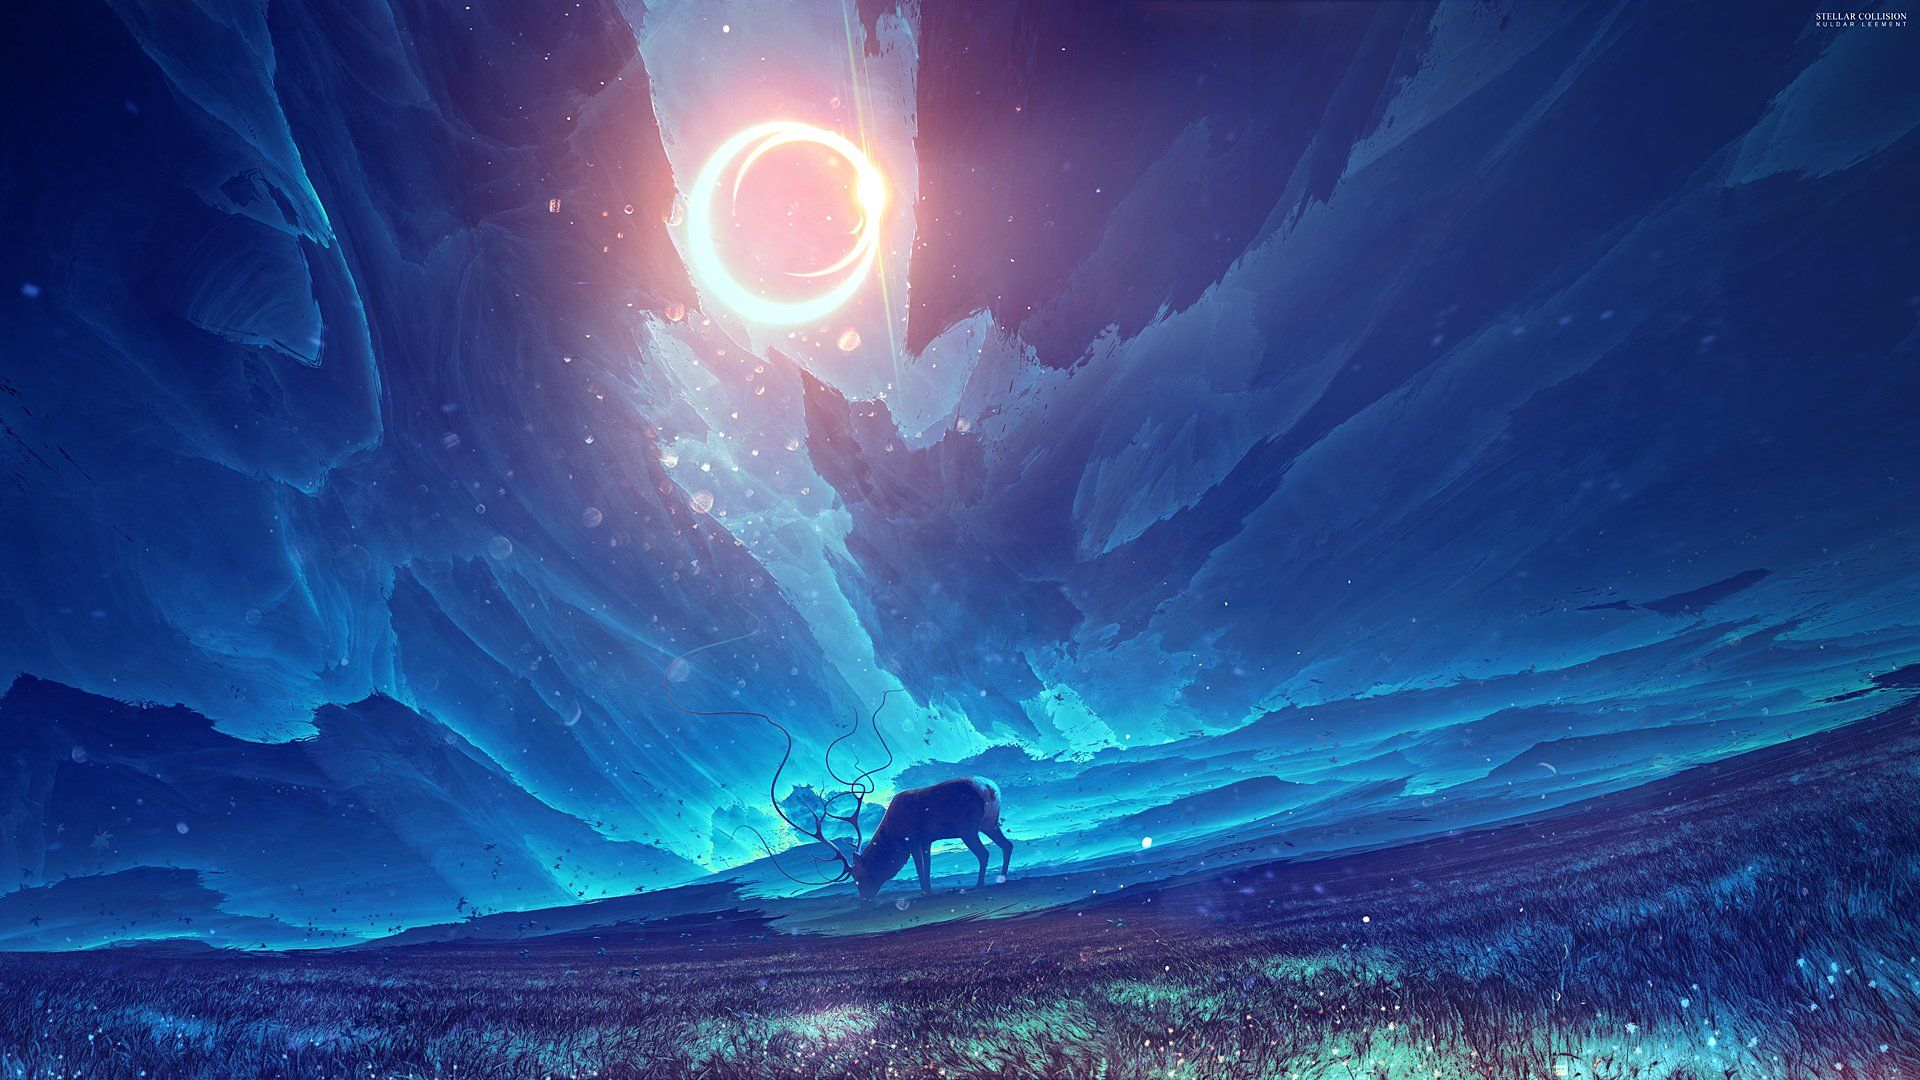 Anime Sky Wallpaper Picture For Desktop X  Kb